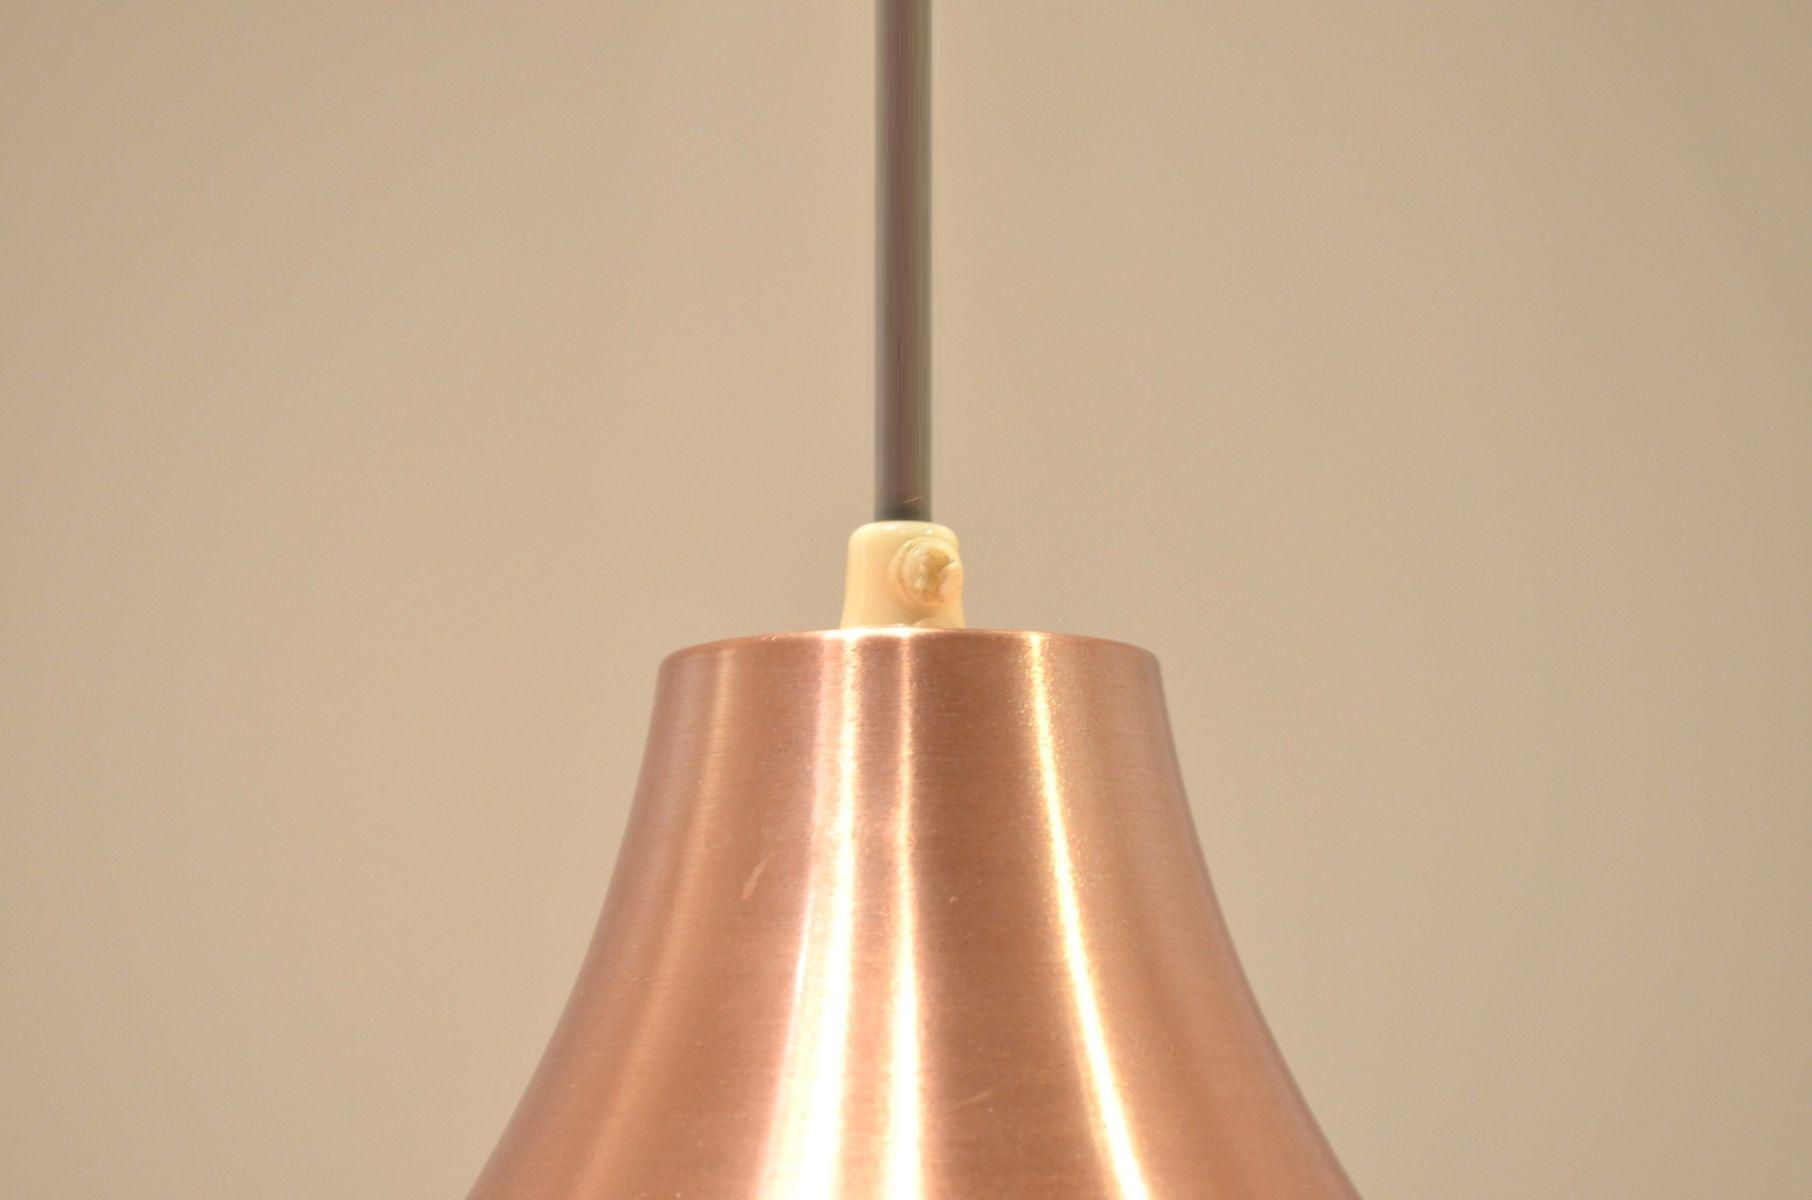 lampe suspension multiple rose en lamelle de cuivre danemark en vente sur pamono. Black Bedroom Furniture Sets. Home Design Ideas